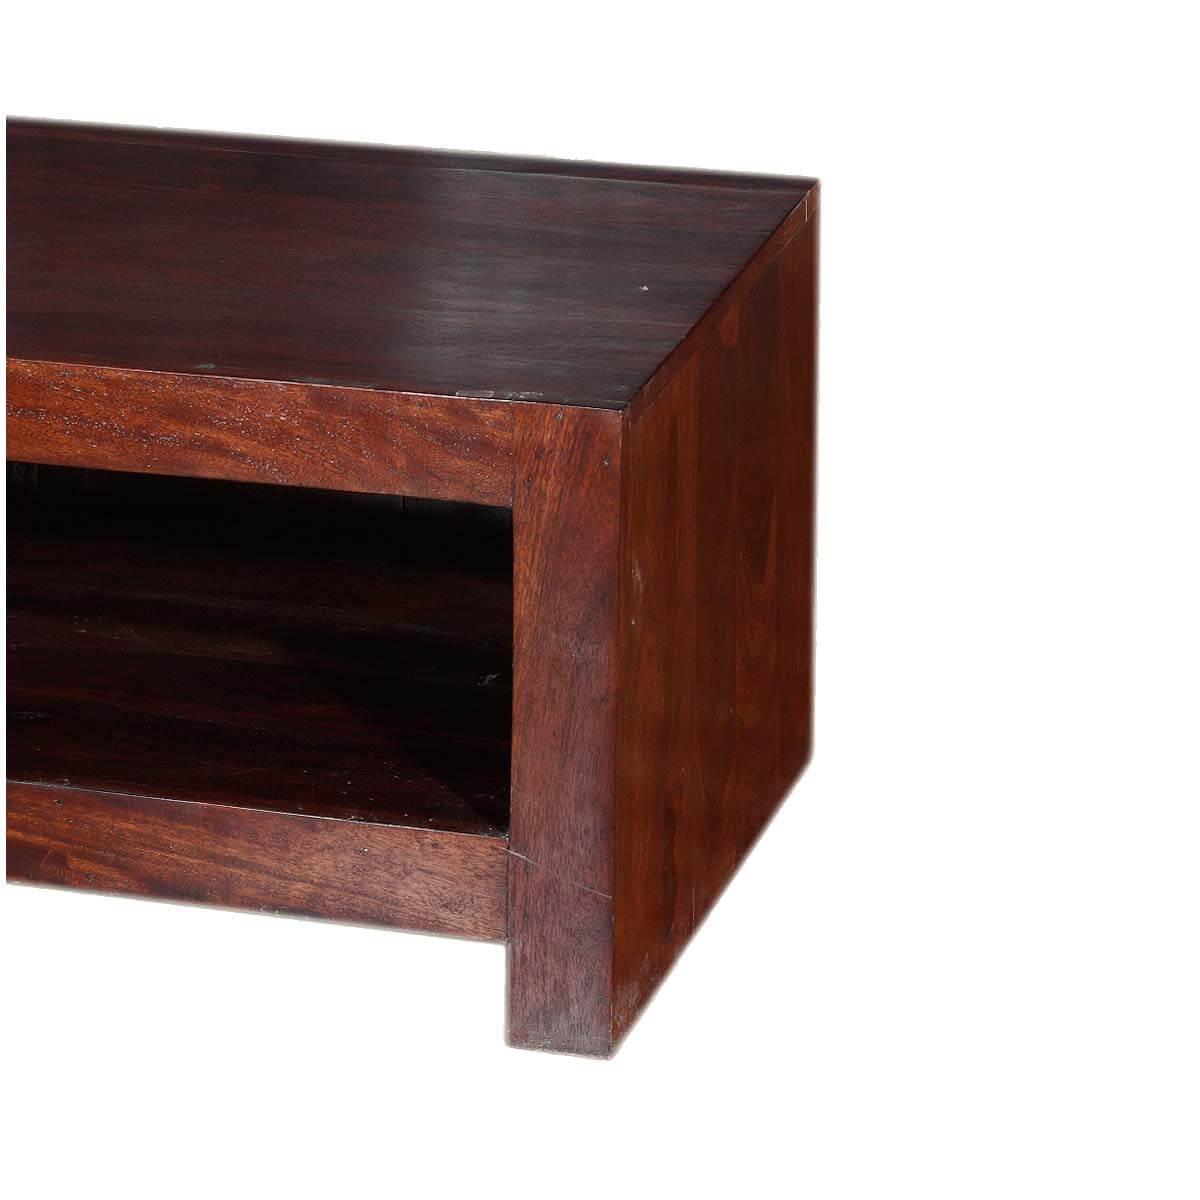 Santa fe easy solid wood single shelf tv cabinet coffee table santa fe easy indian rosewood single shelf tv cabinet coffee table geotapseo Choice Image